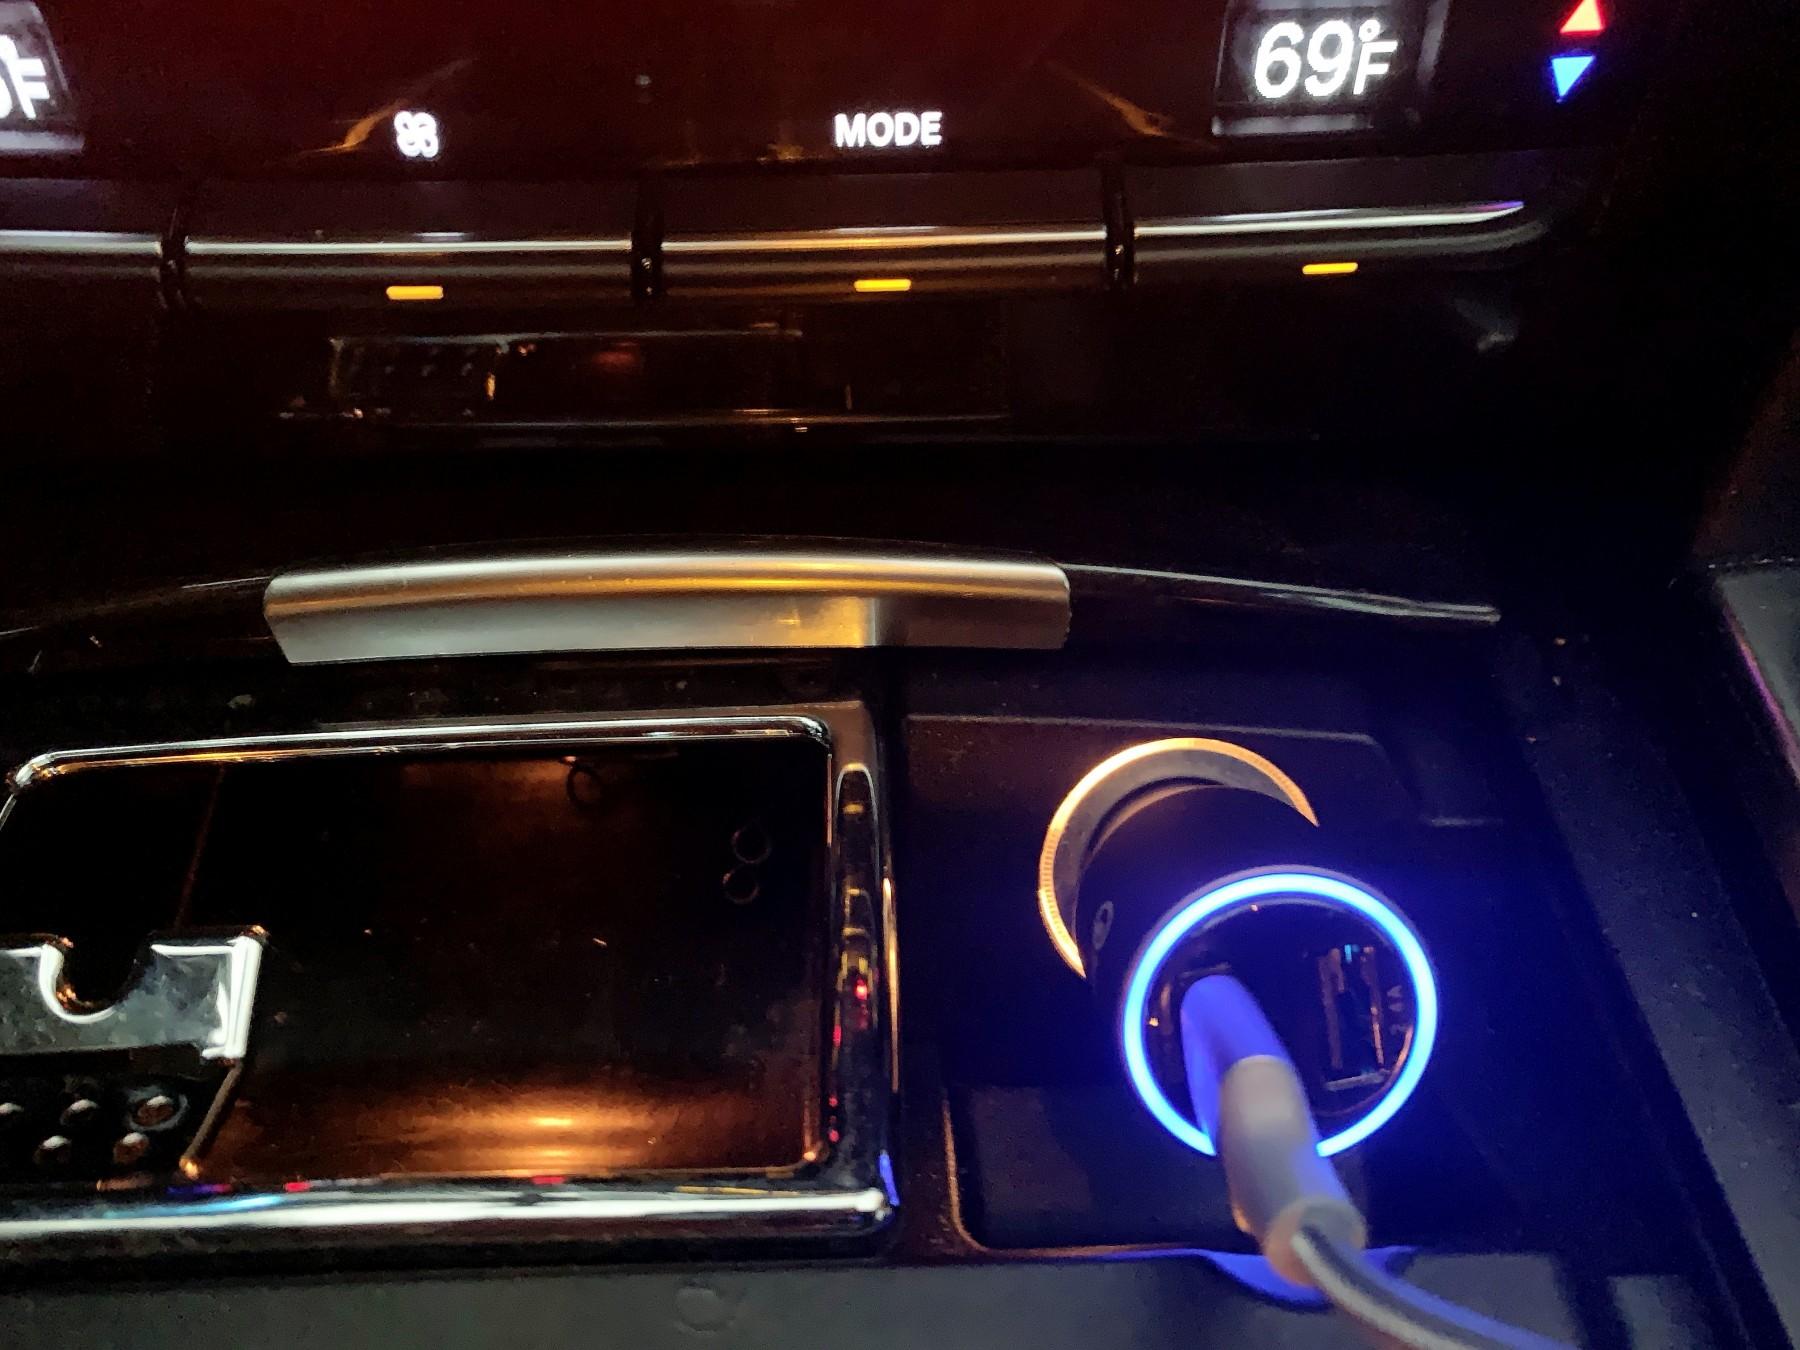 Nice quality car USB charger